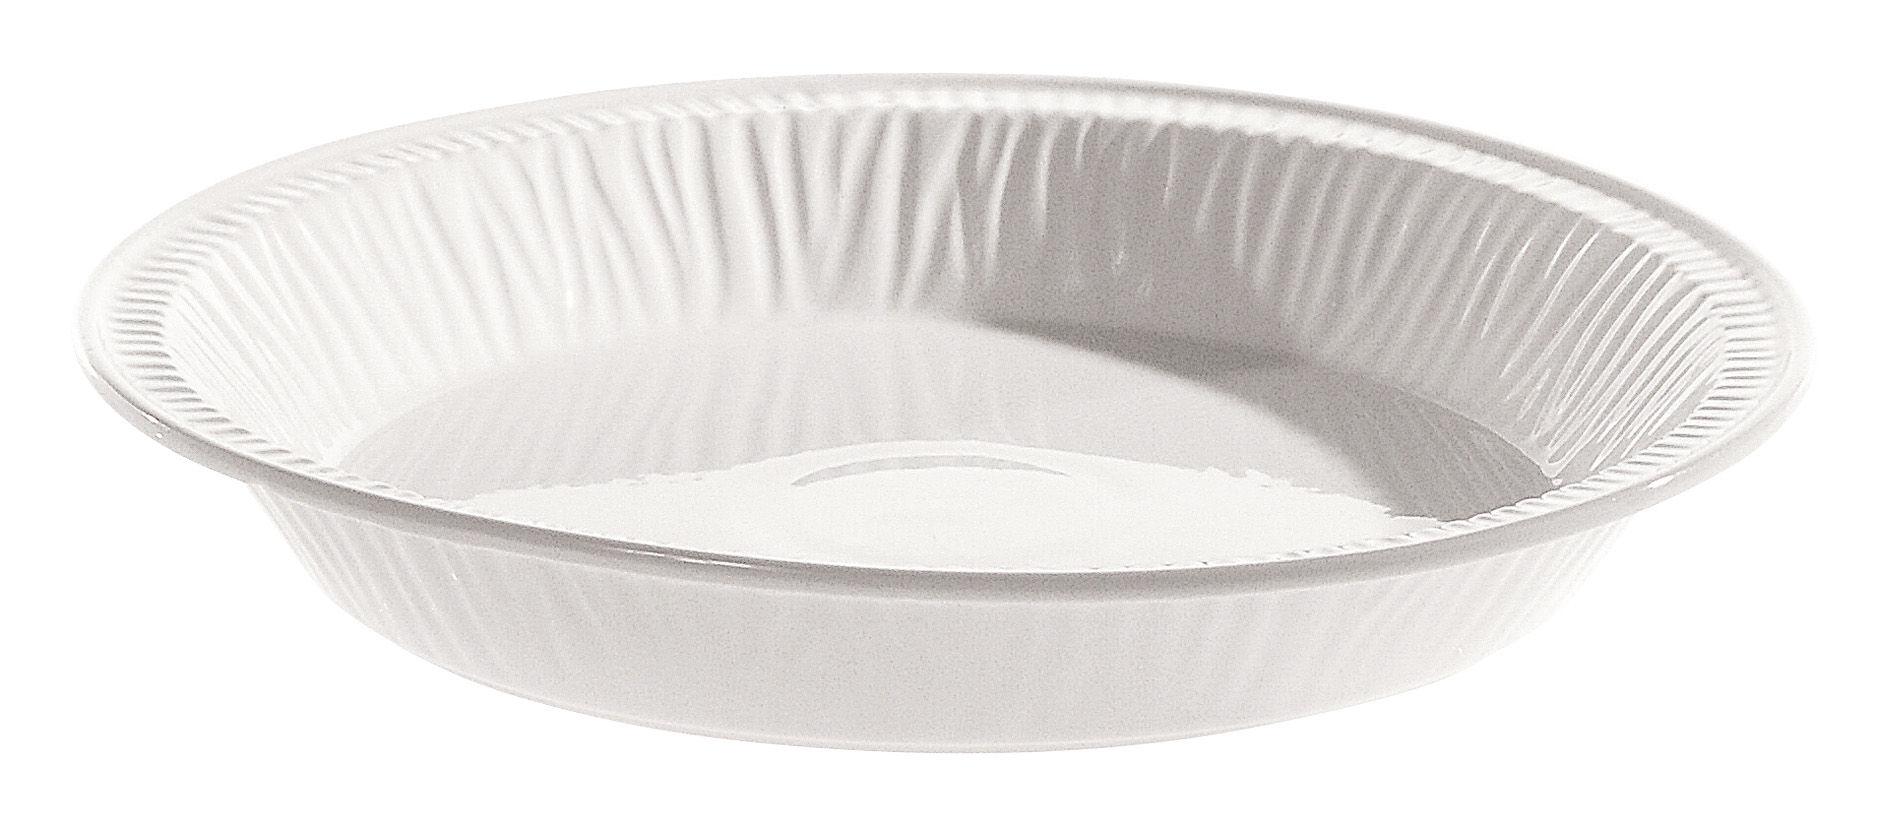 Tischkultur - Teller - Estetico quotidiano Suppenteller Ø 23 cm - aus Porzellan - Seletti - Weiß / Suppenteller Ø 23 cm - Porzellan